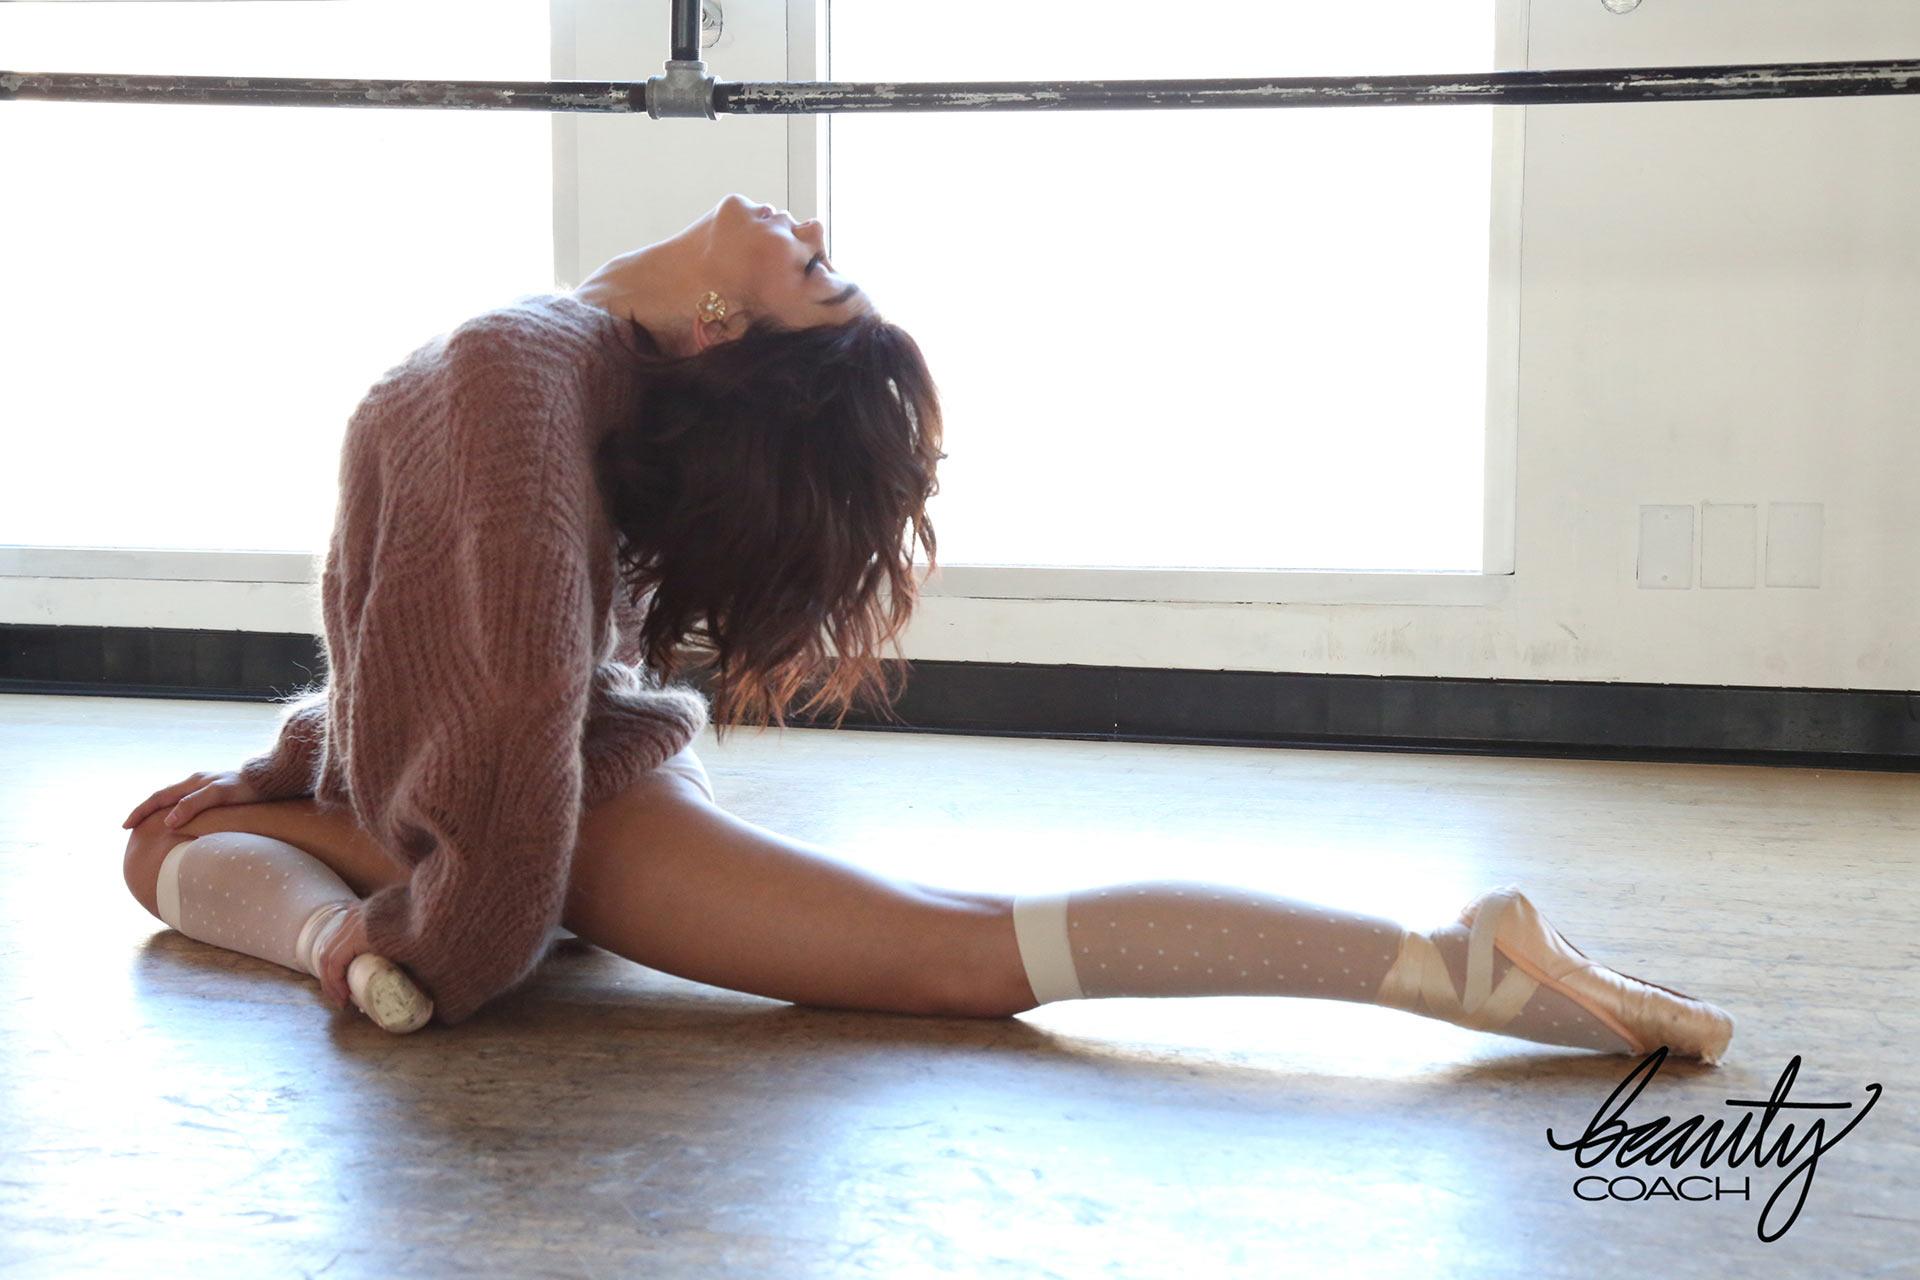 Сара Хайланд в образе балерины